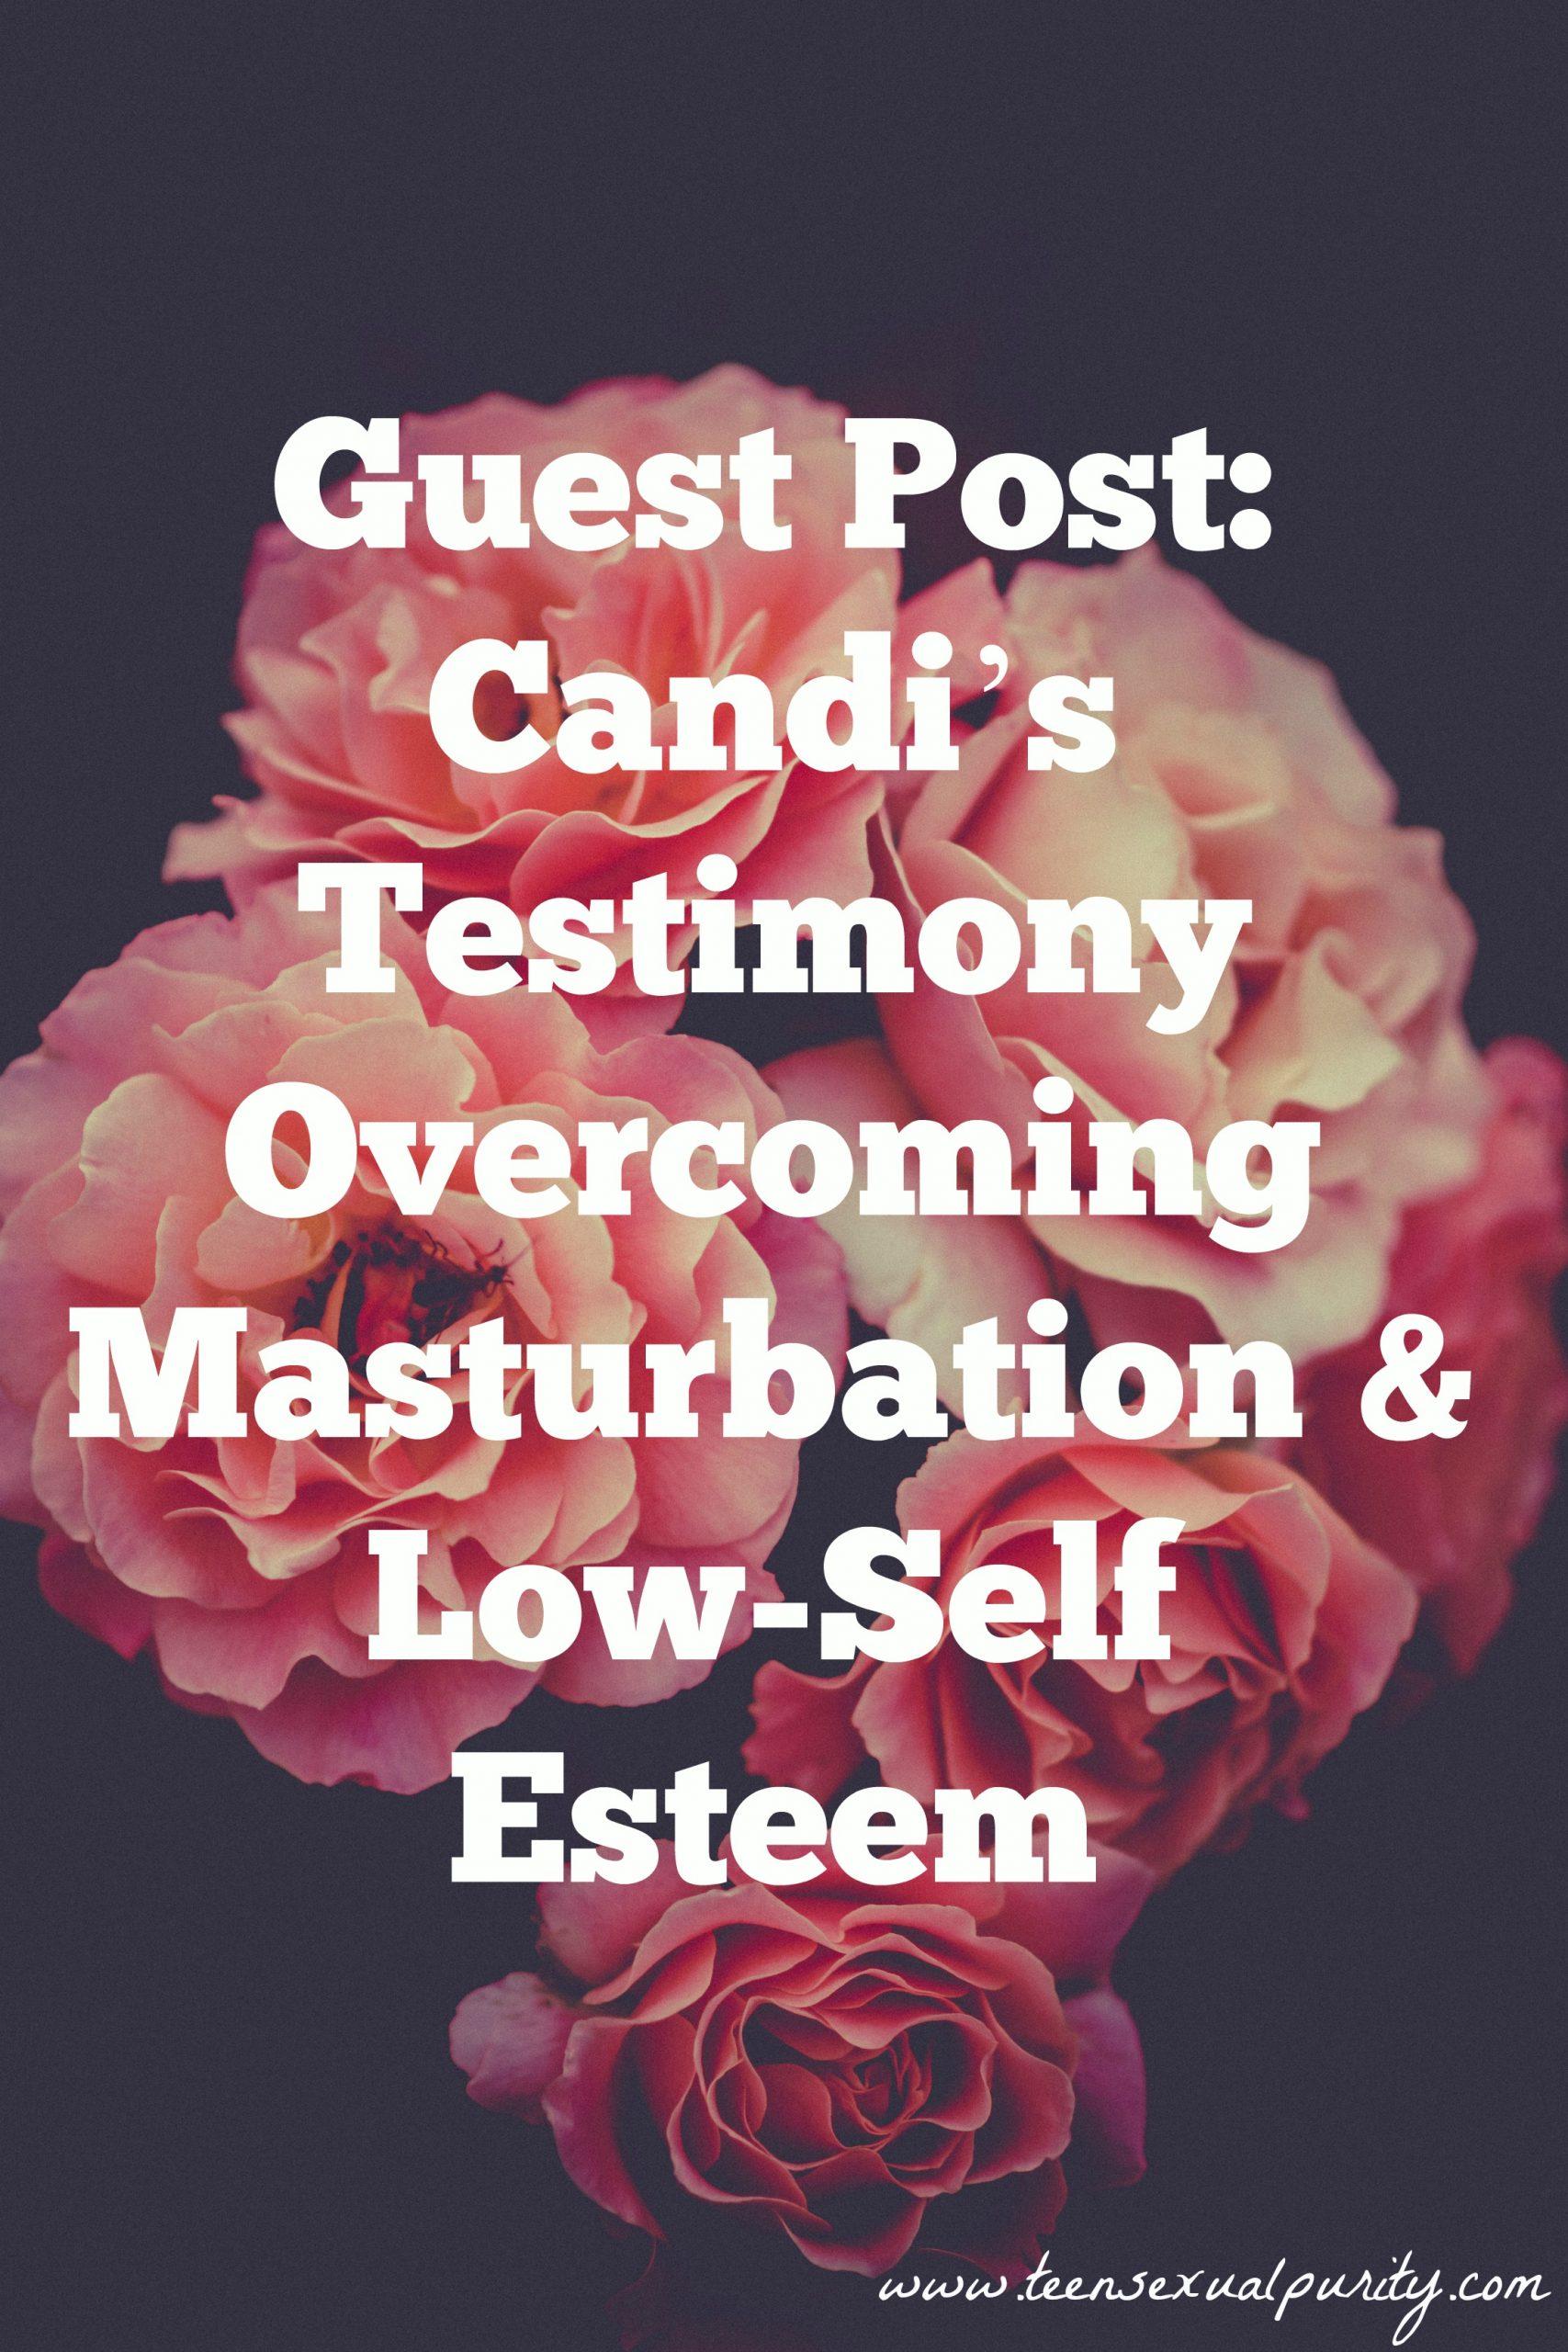 Guest Post: Candi's Testimony Overcoming Masturbation & Low-Self Esteem